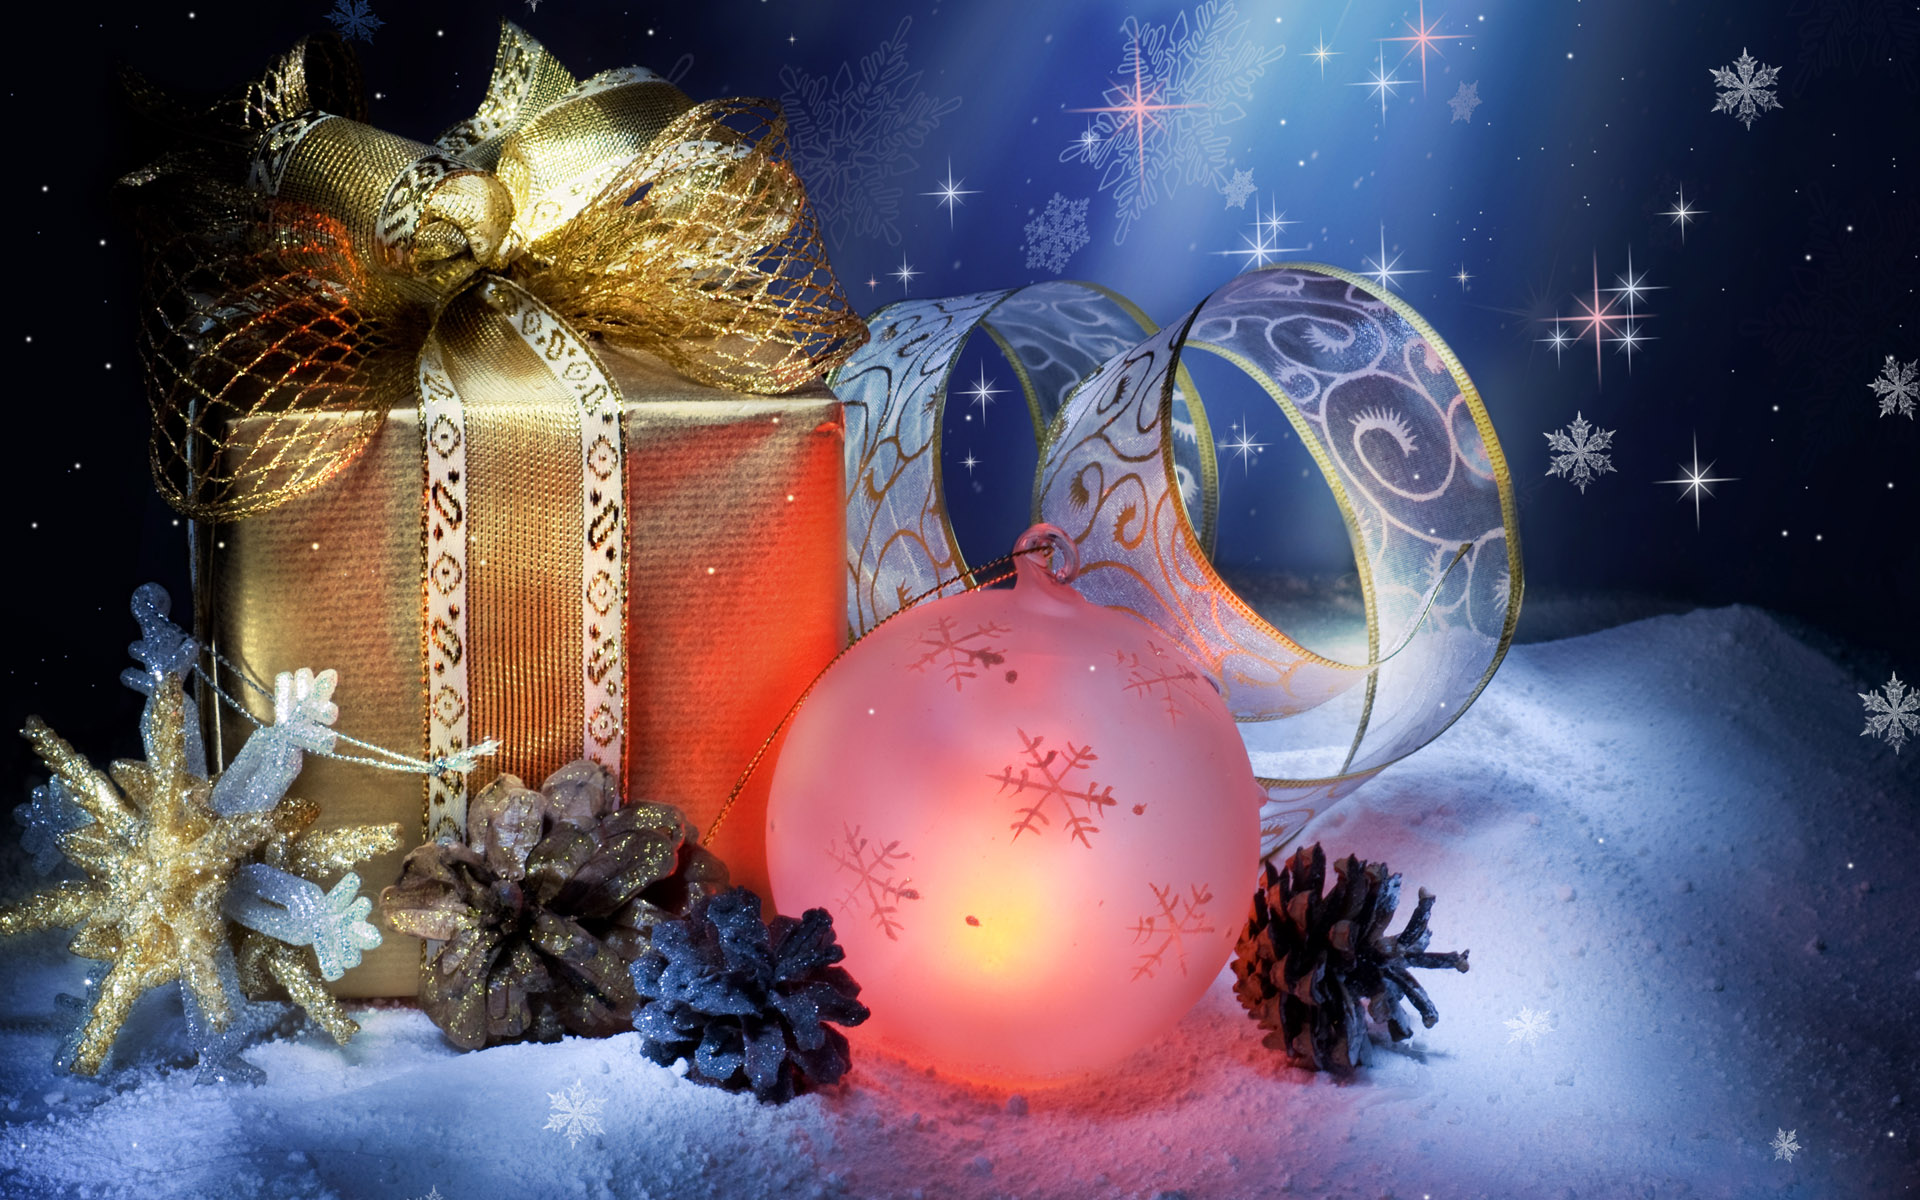 Incredible Free Christmas Desktop Wallpaper